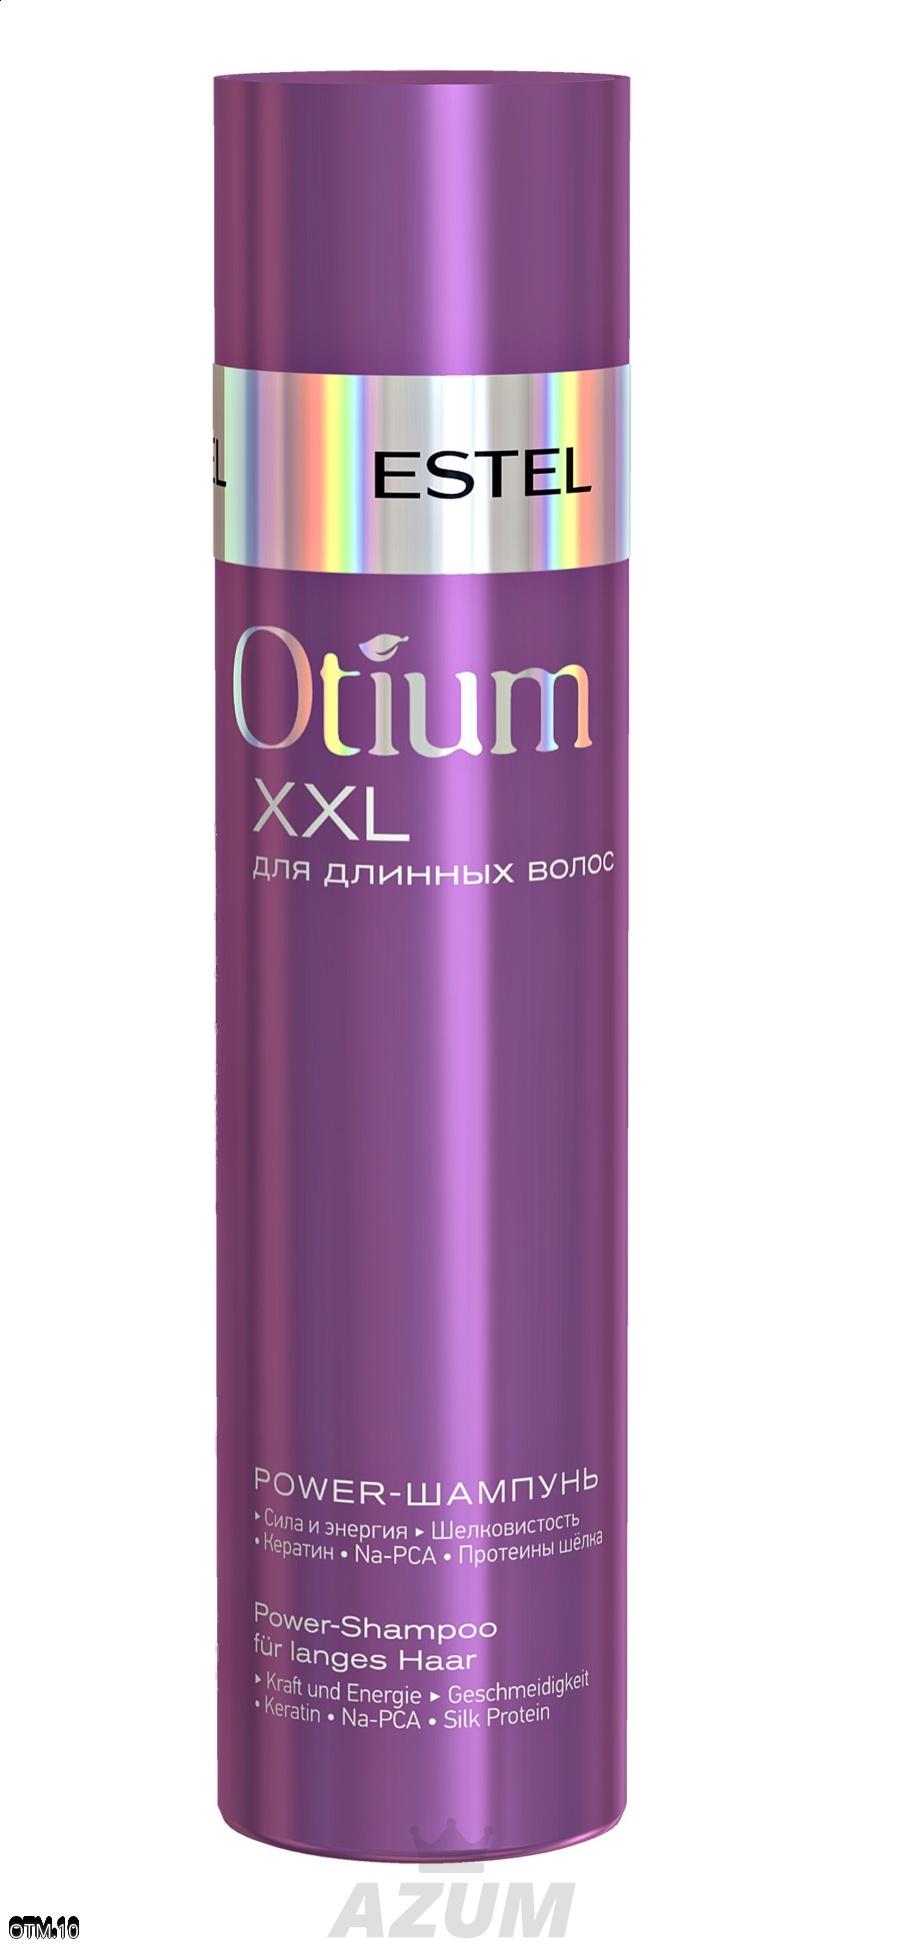 Power-шампунь для длинных волос OTIUM XXL, 250 мл otium xxl power шампунь для длинных волос эстель shampoo 250 мл